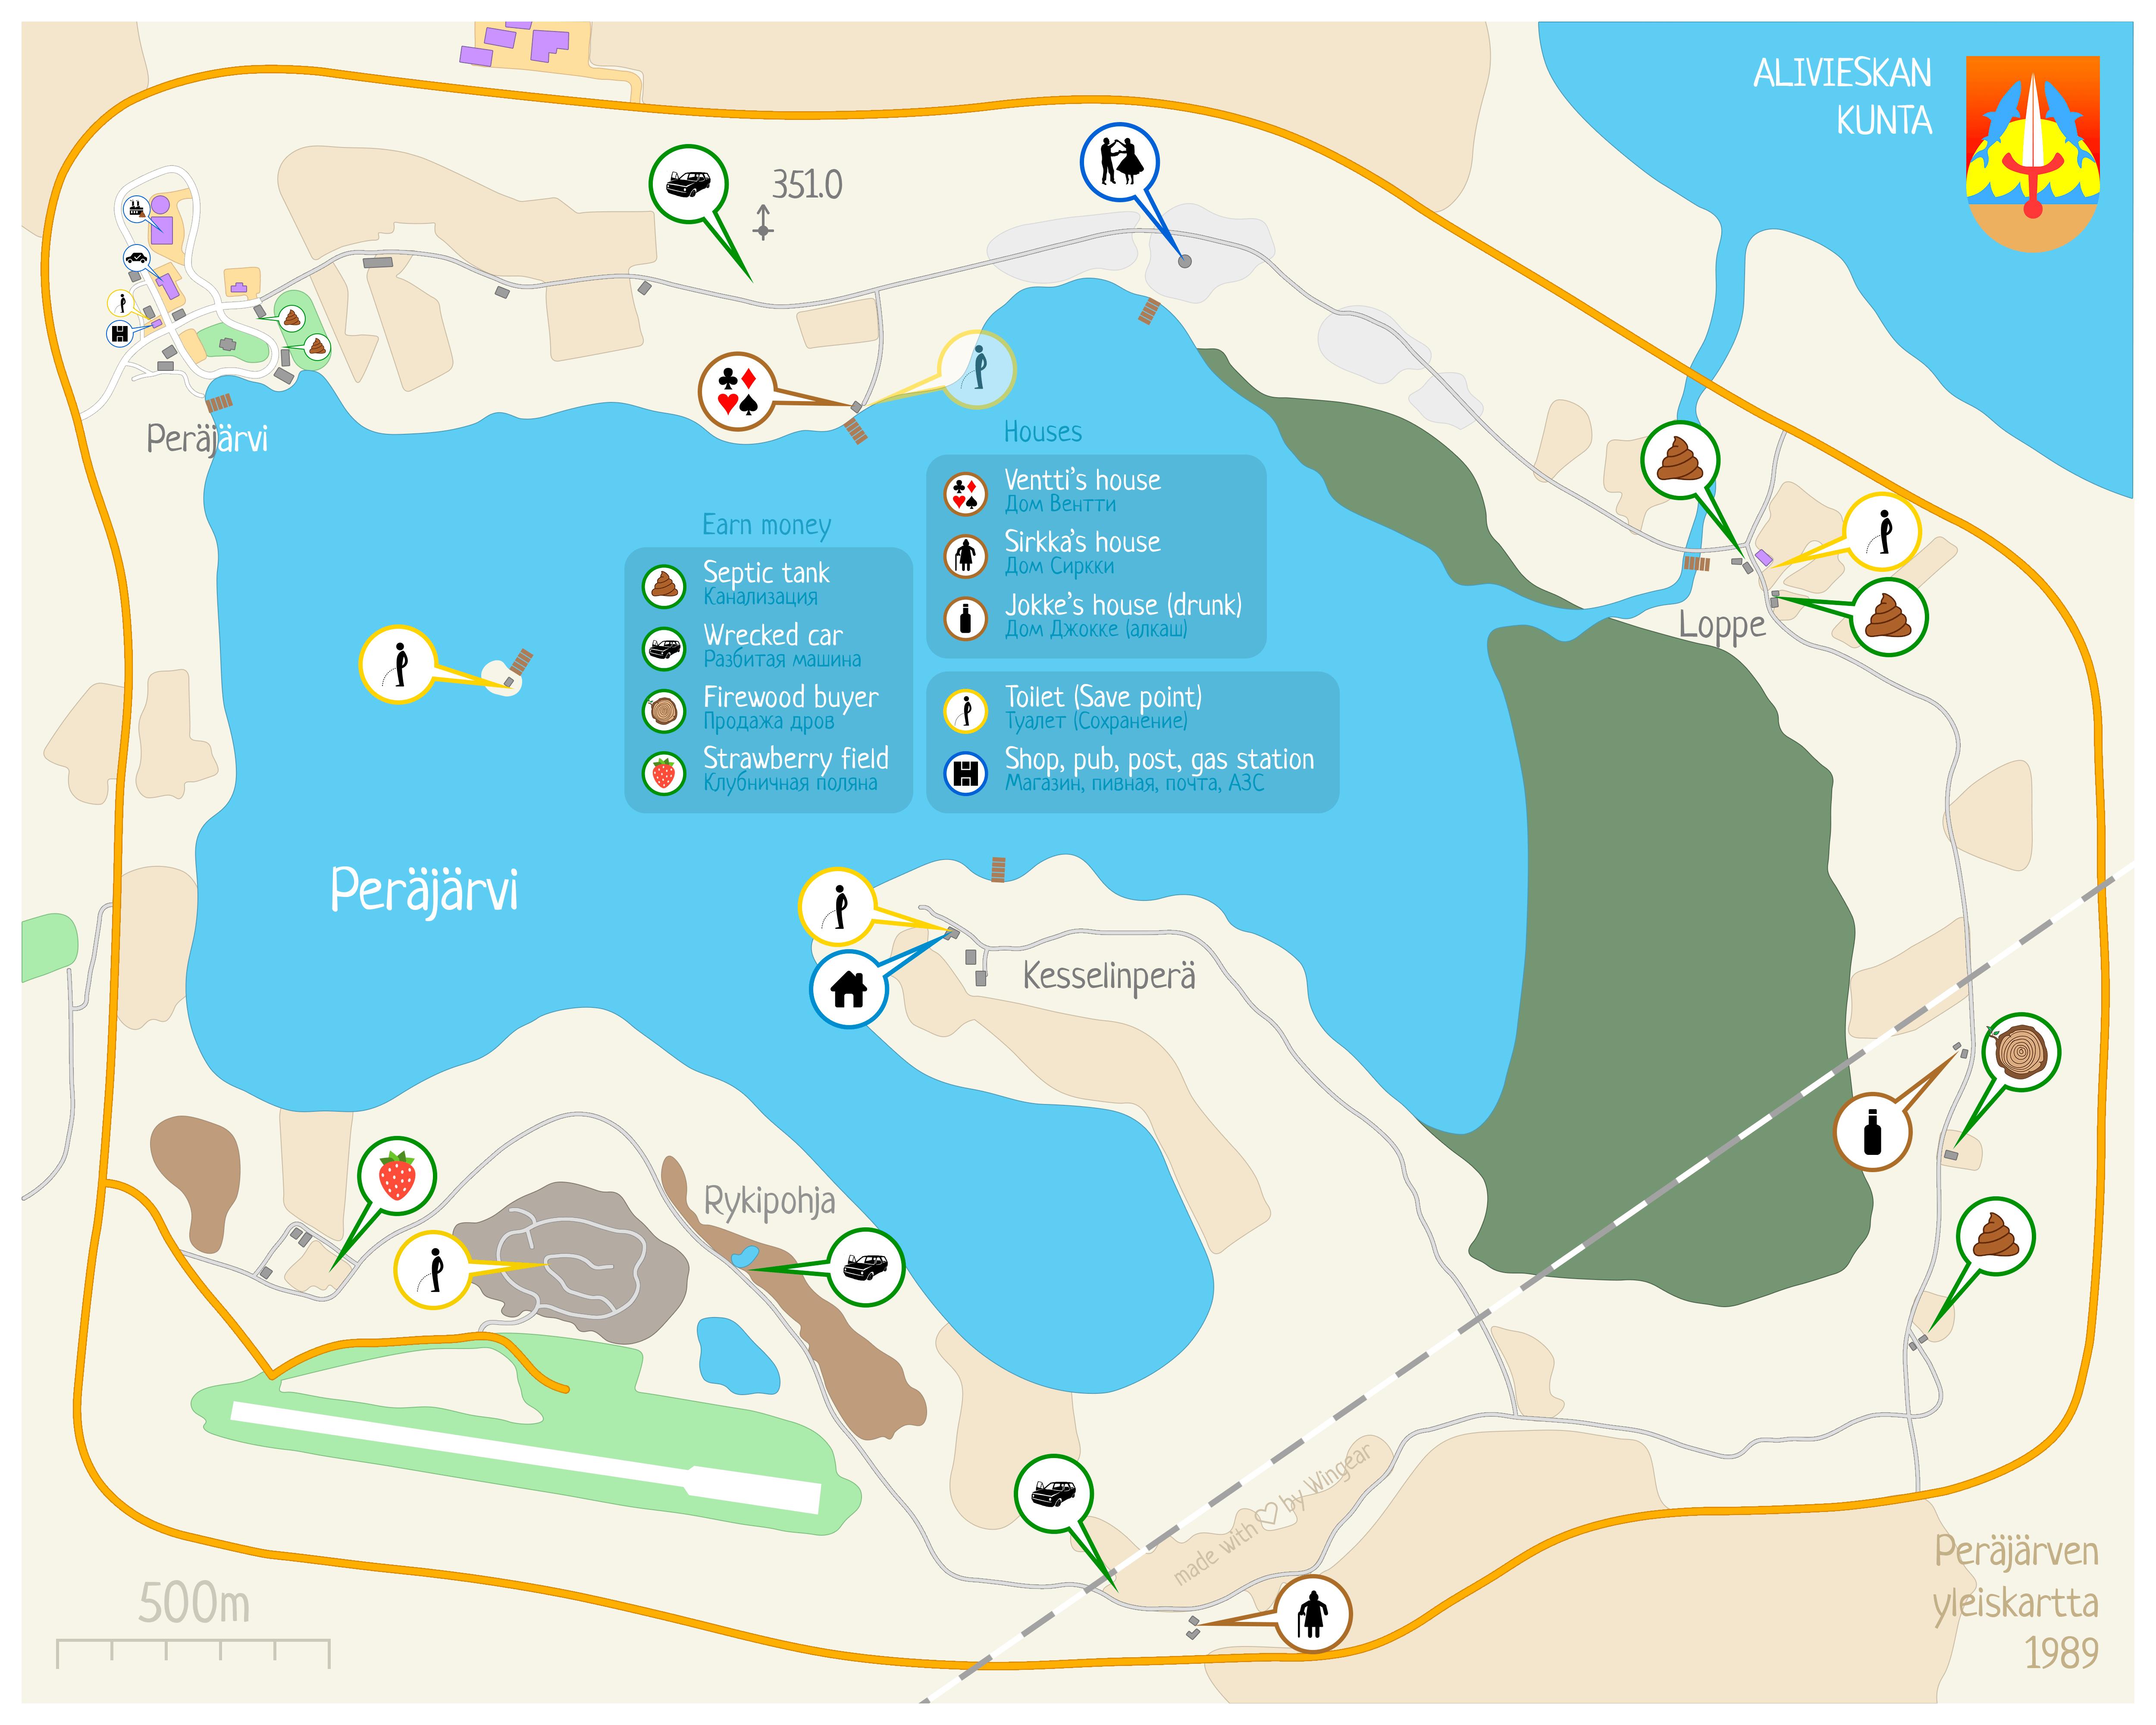 My Summer Car Mapa.Communaute Steam Guide 4k Map 3 0 Karta 3 0